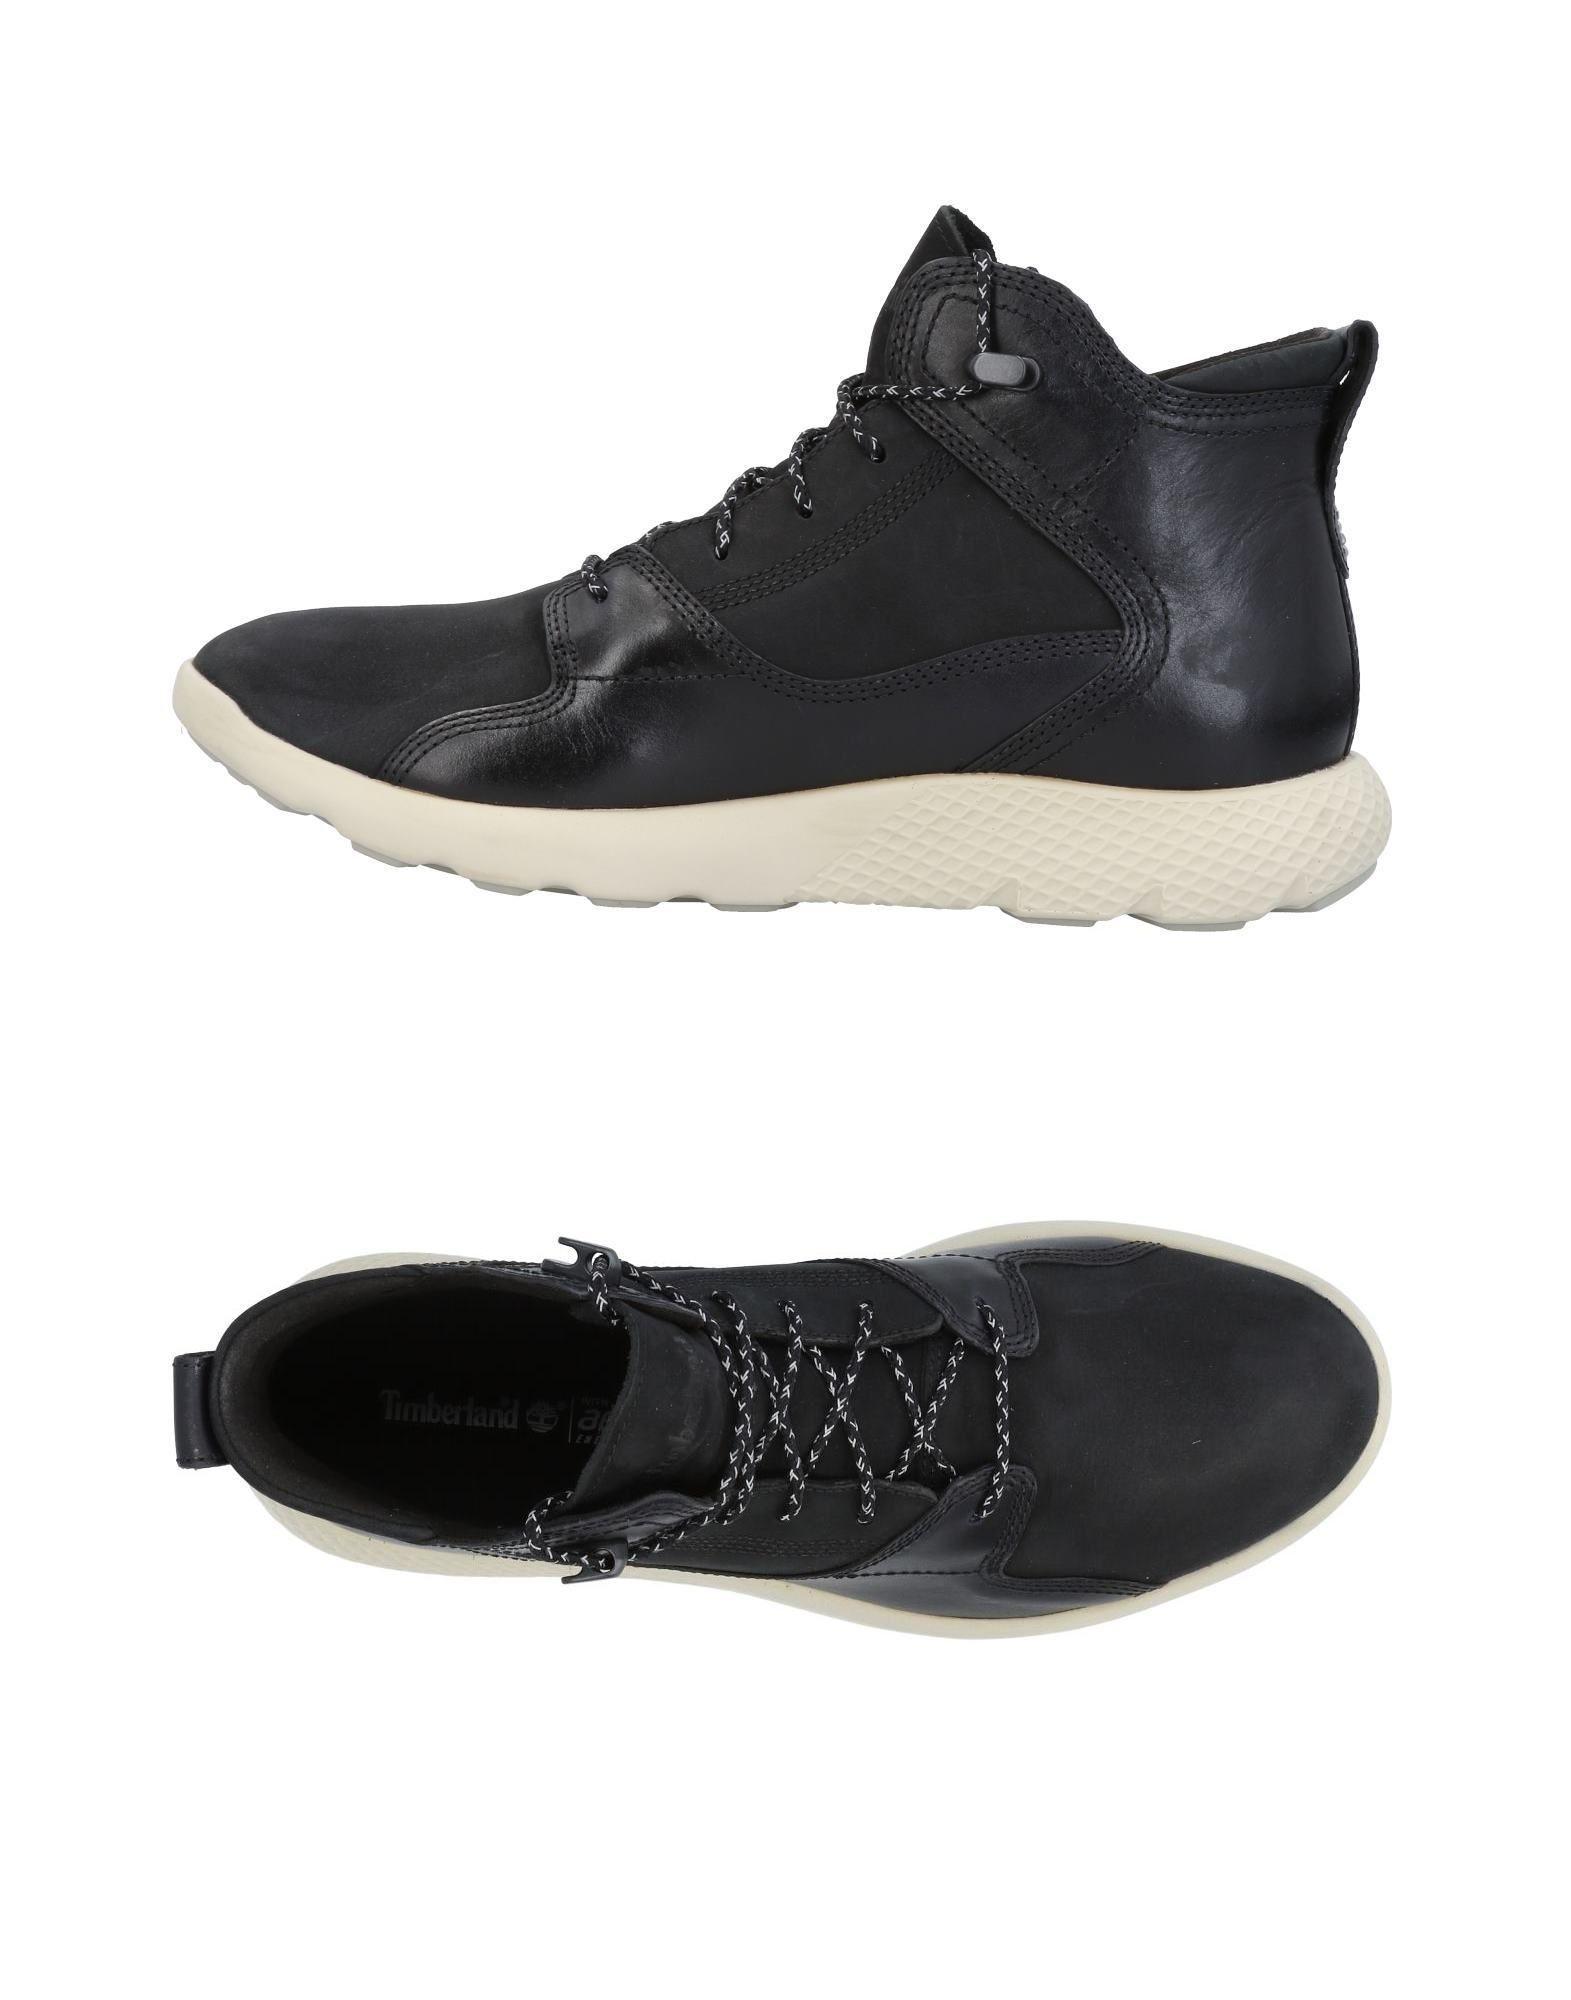 Timberland Sneakers In Black